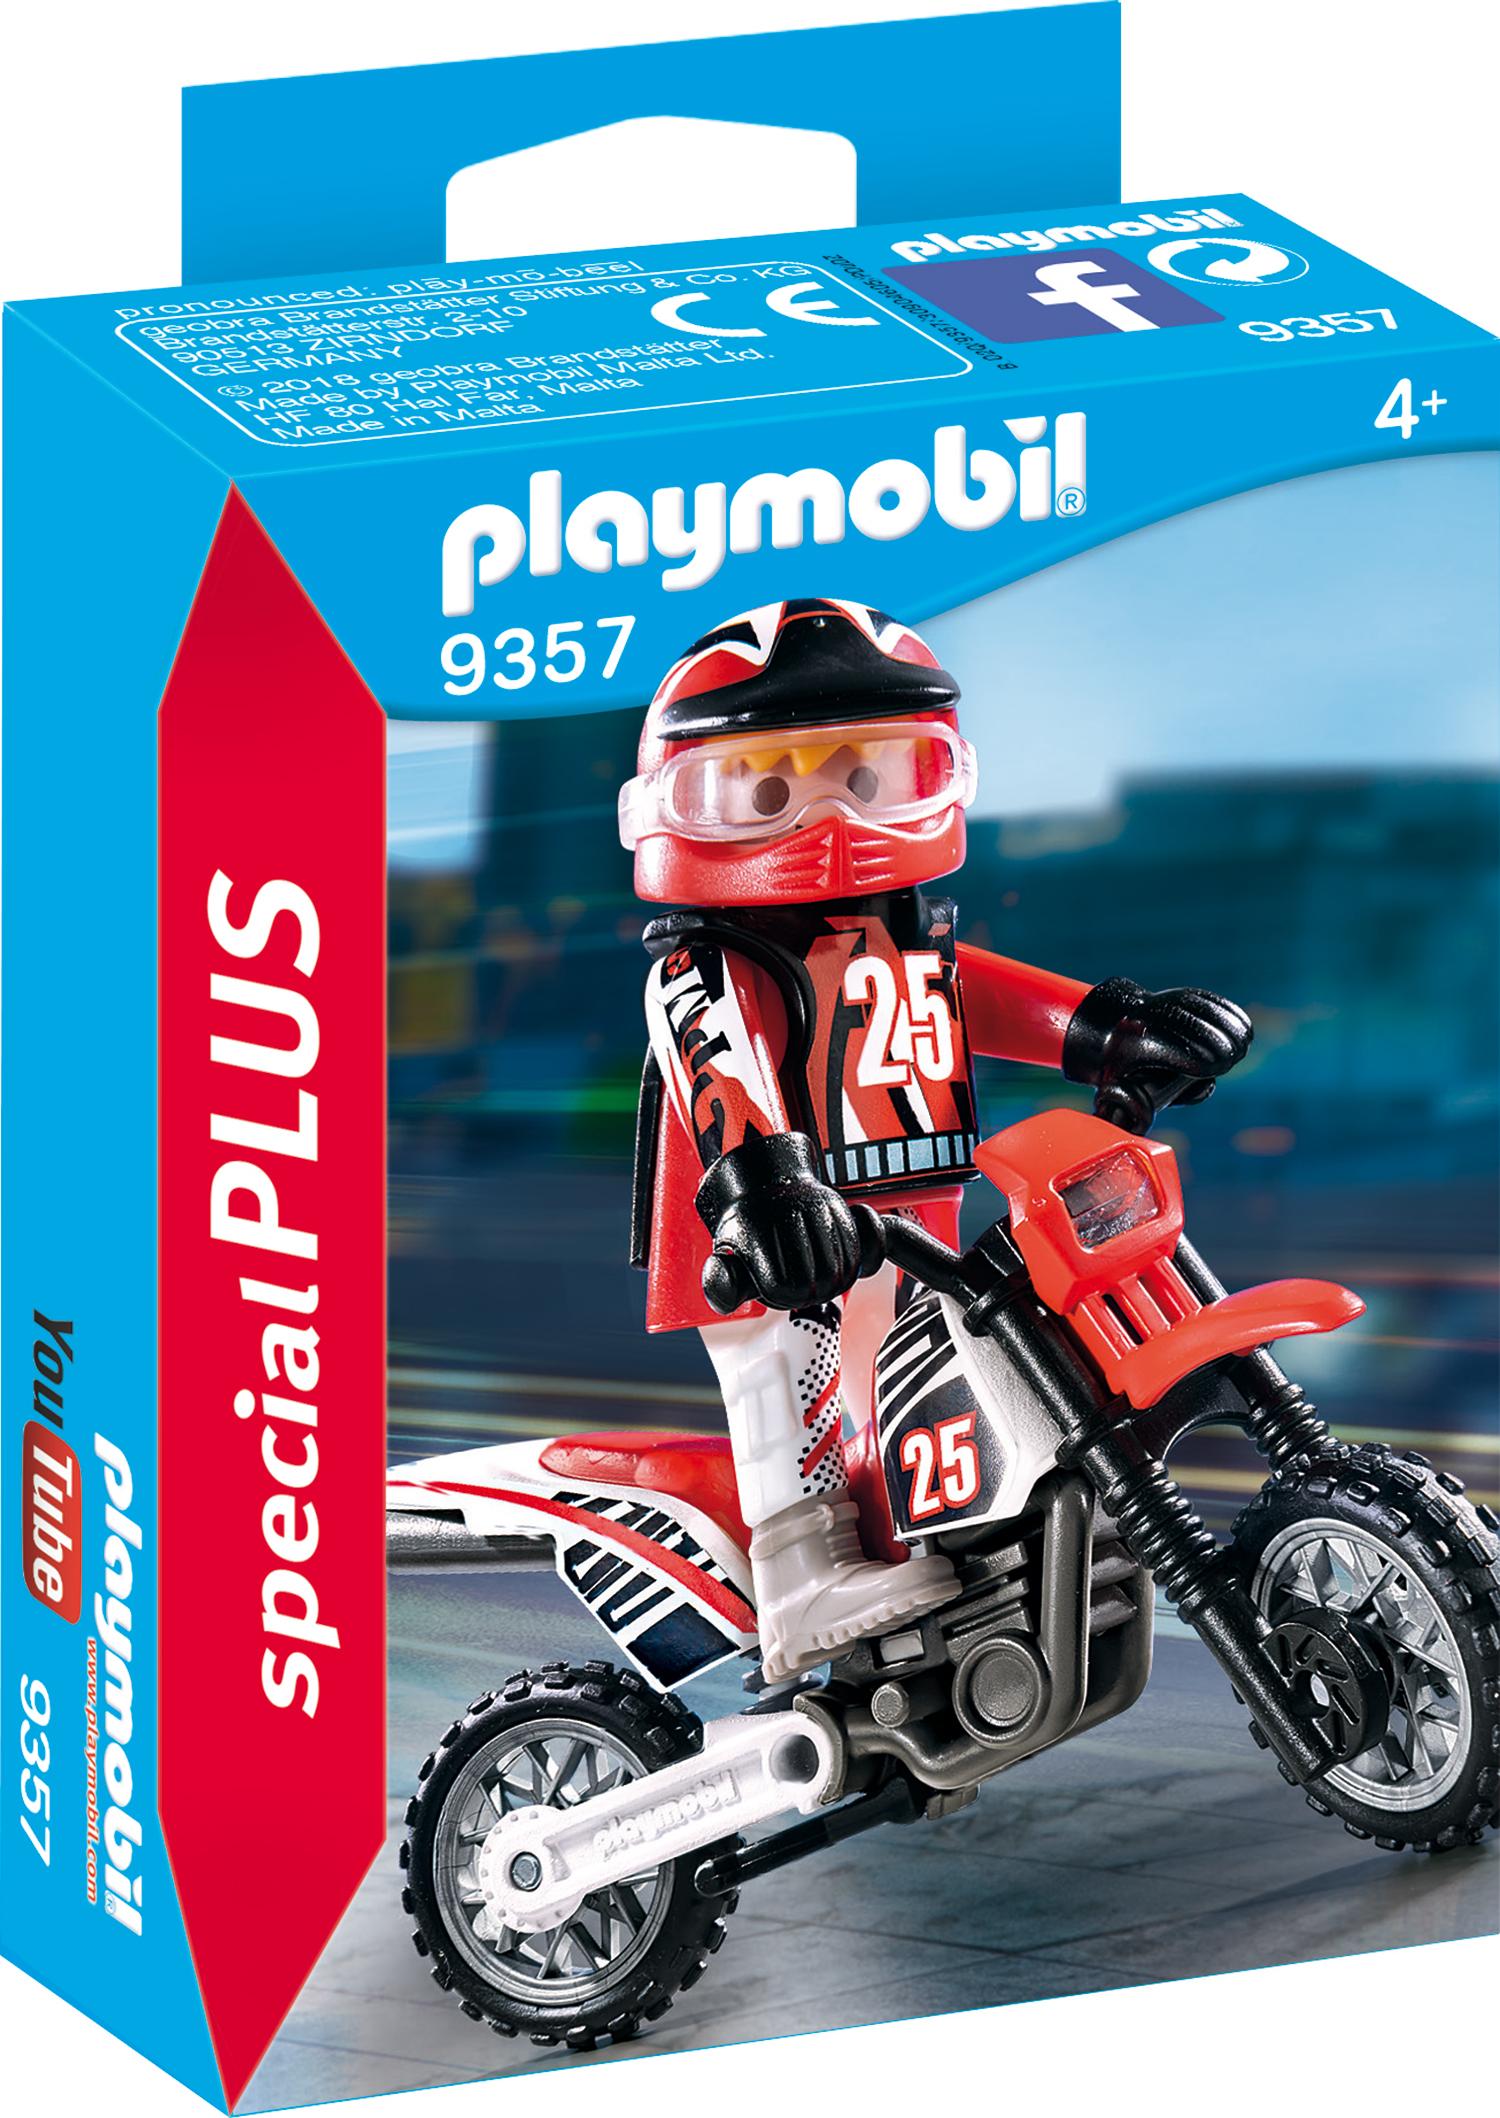 Figurina motociclist playmobil